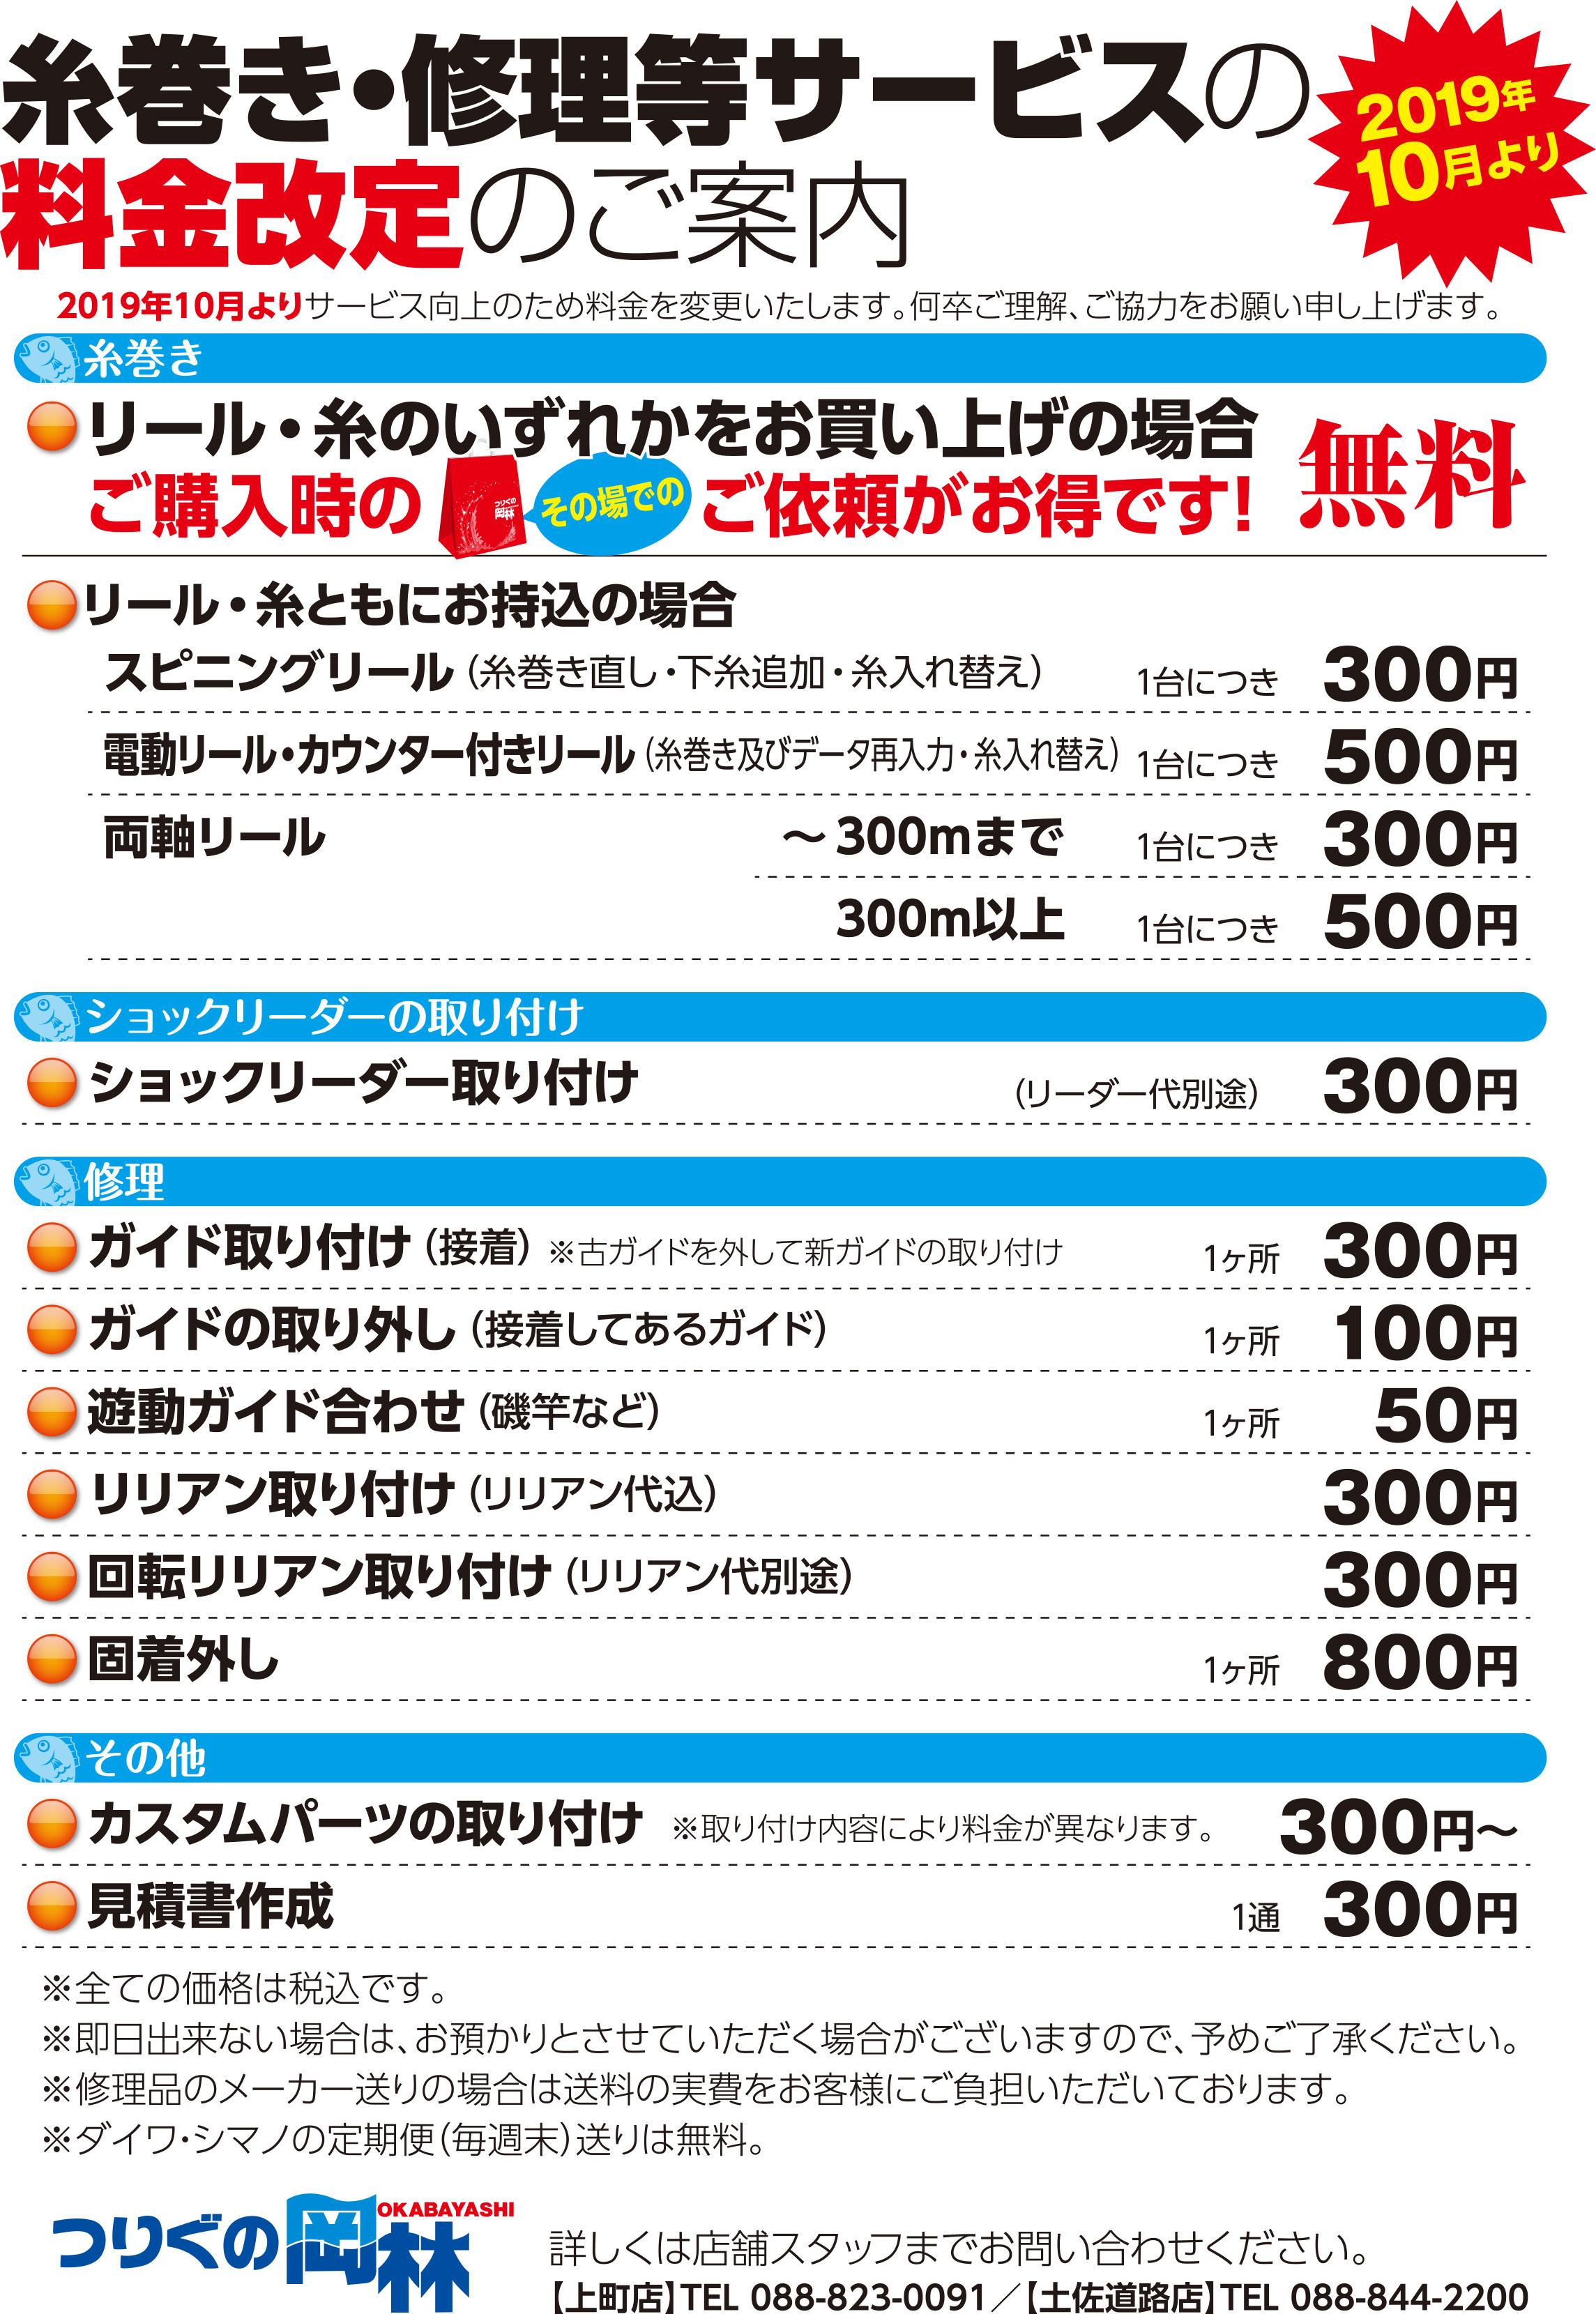 itomaki-full.jpg